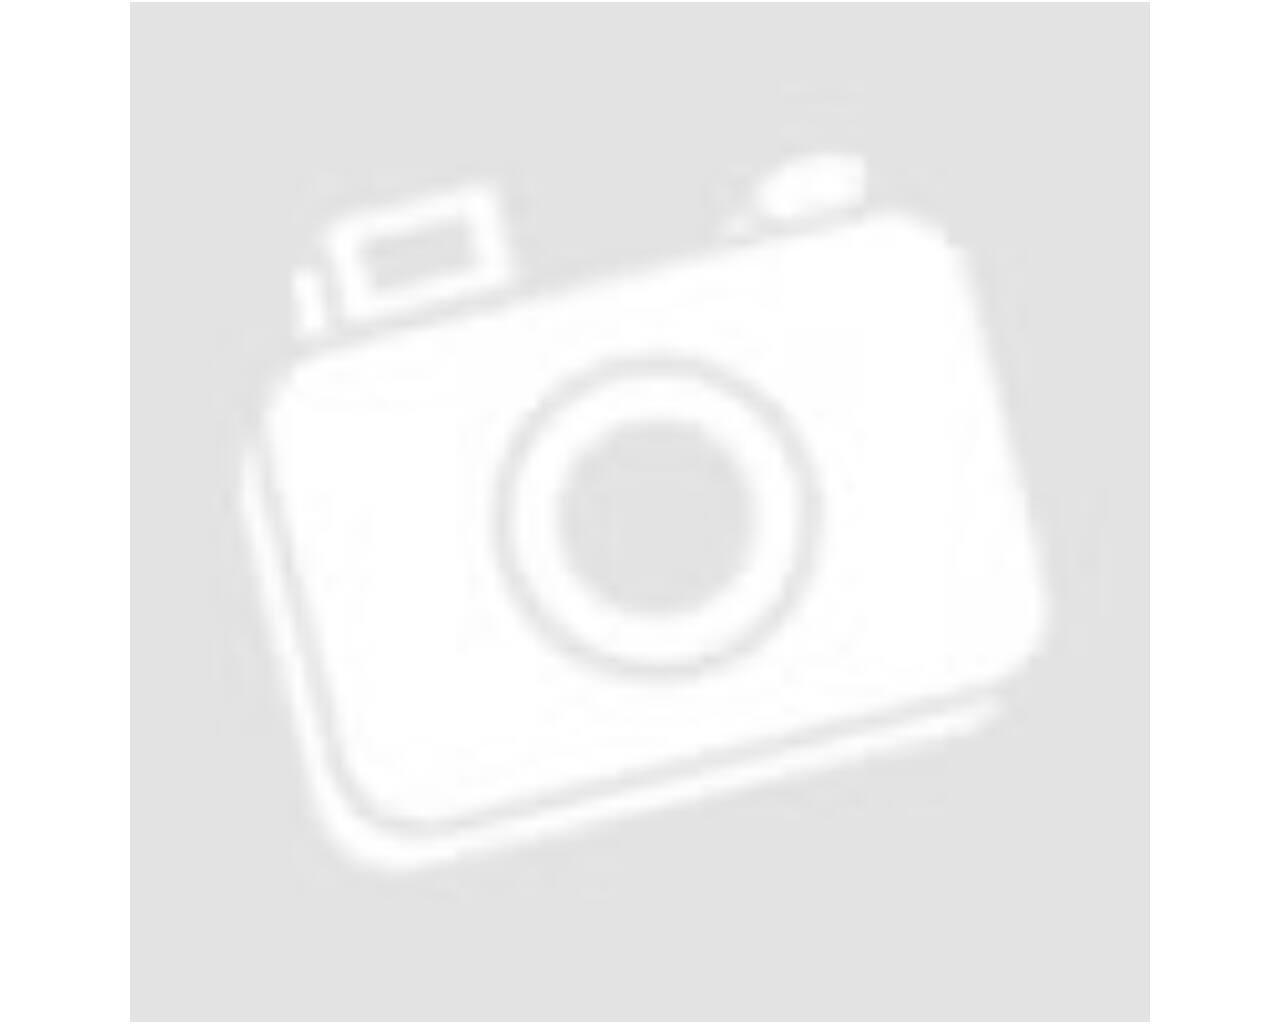 Fekete képkeret LB-242